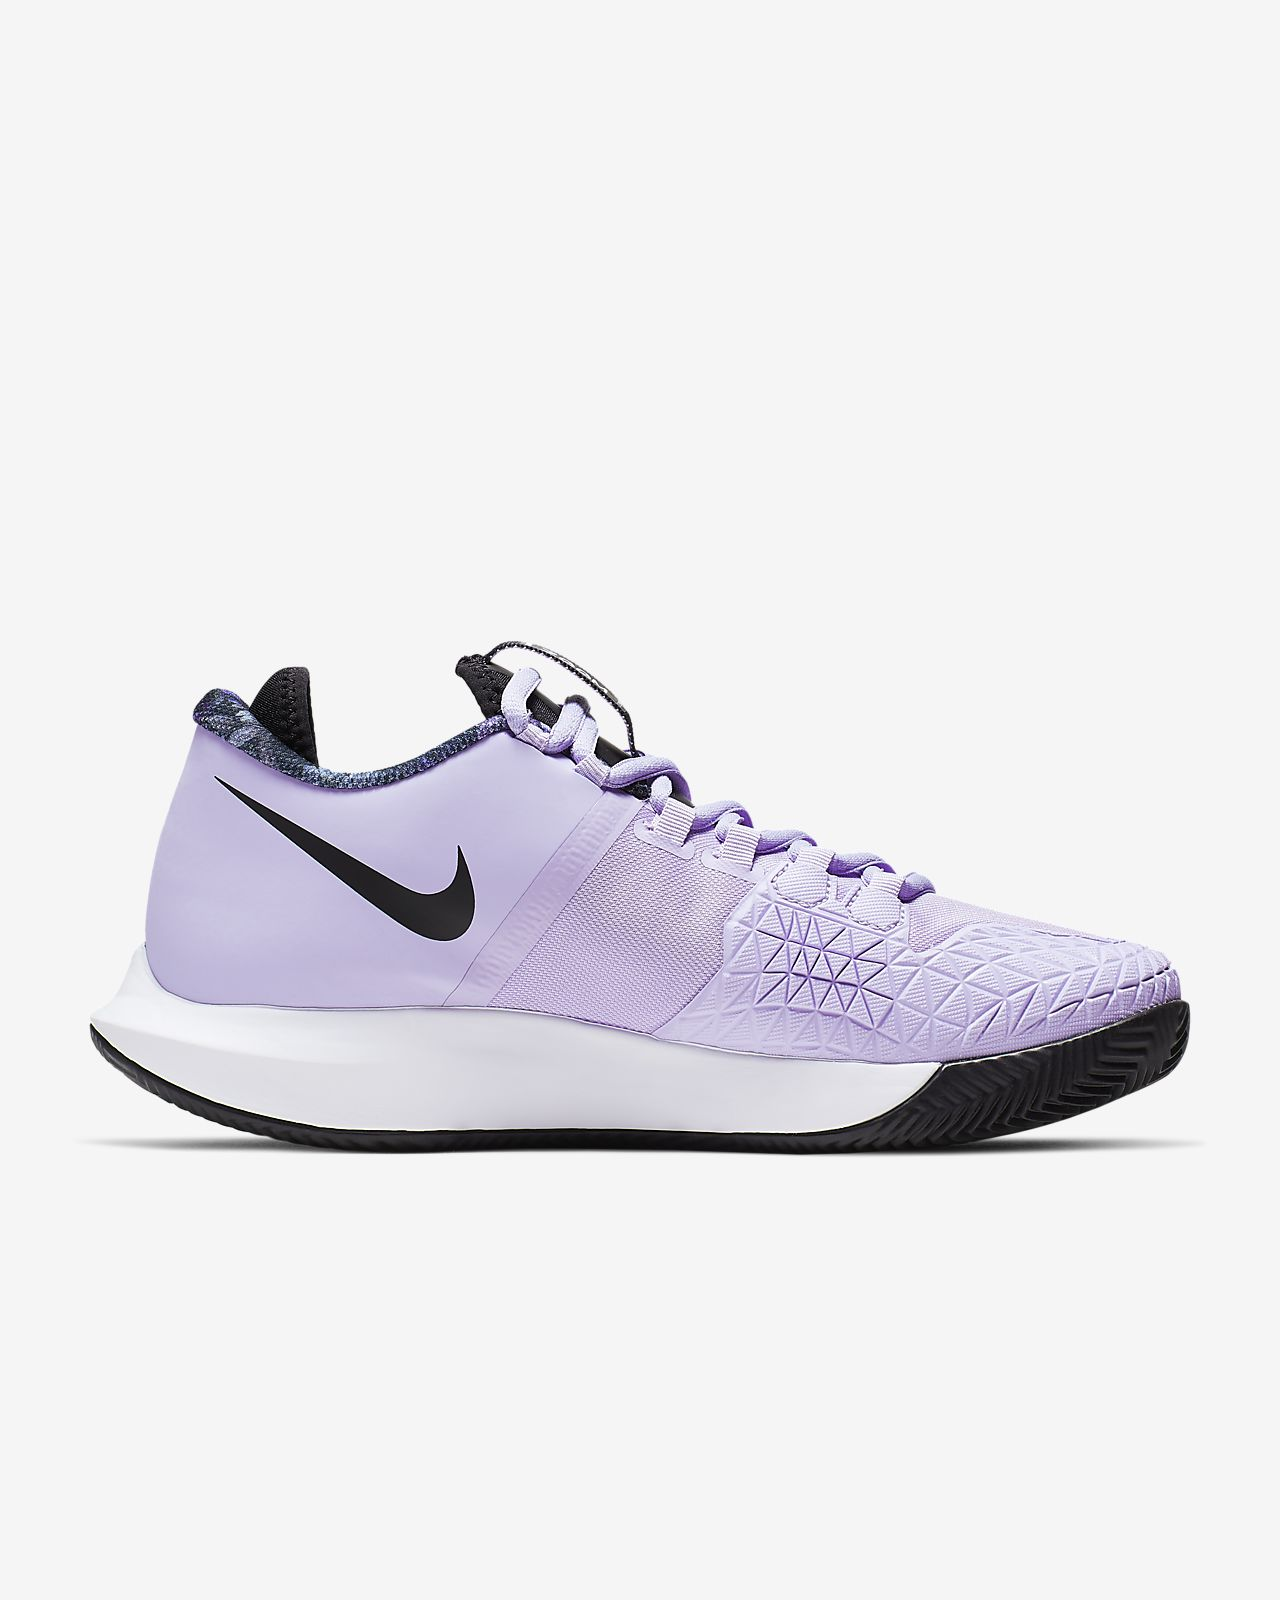 online retailer 5cdb5 91a36 NikeCourt Air Zoom Zero-tennissko til grus til kvinder. Nike.com DK